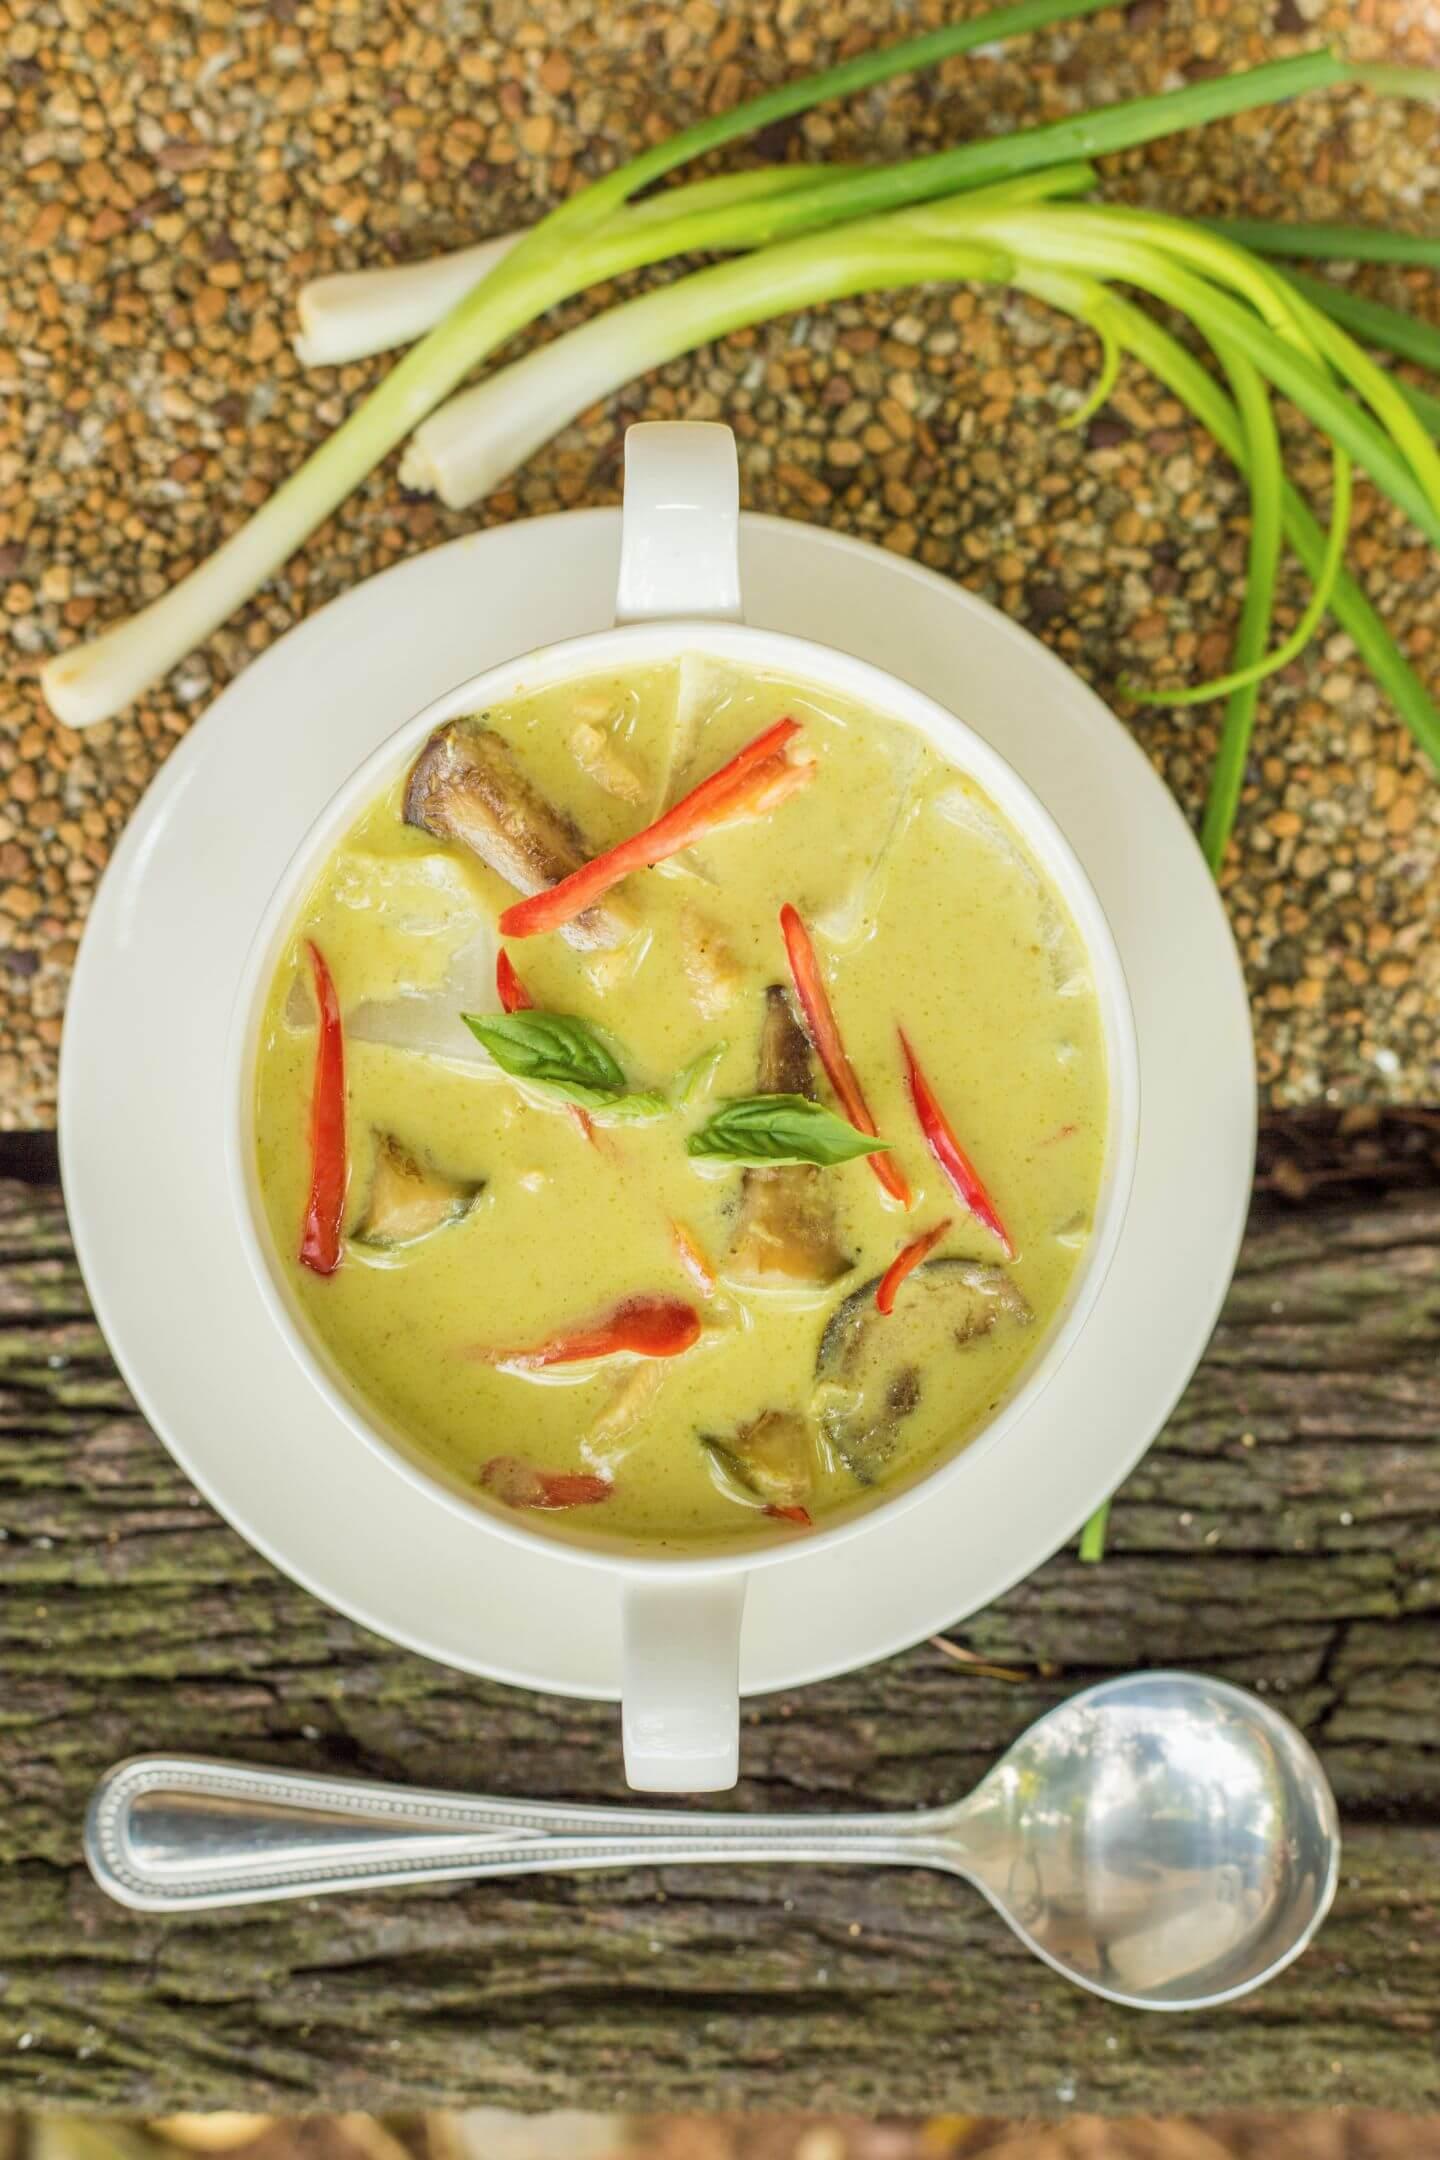 creamy soup of luxury hotel Karma Royal Phuket Cuisine